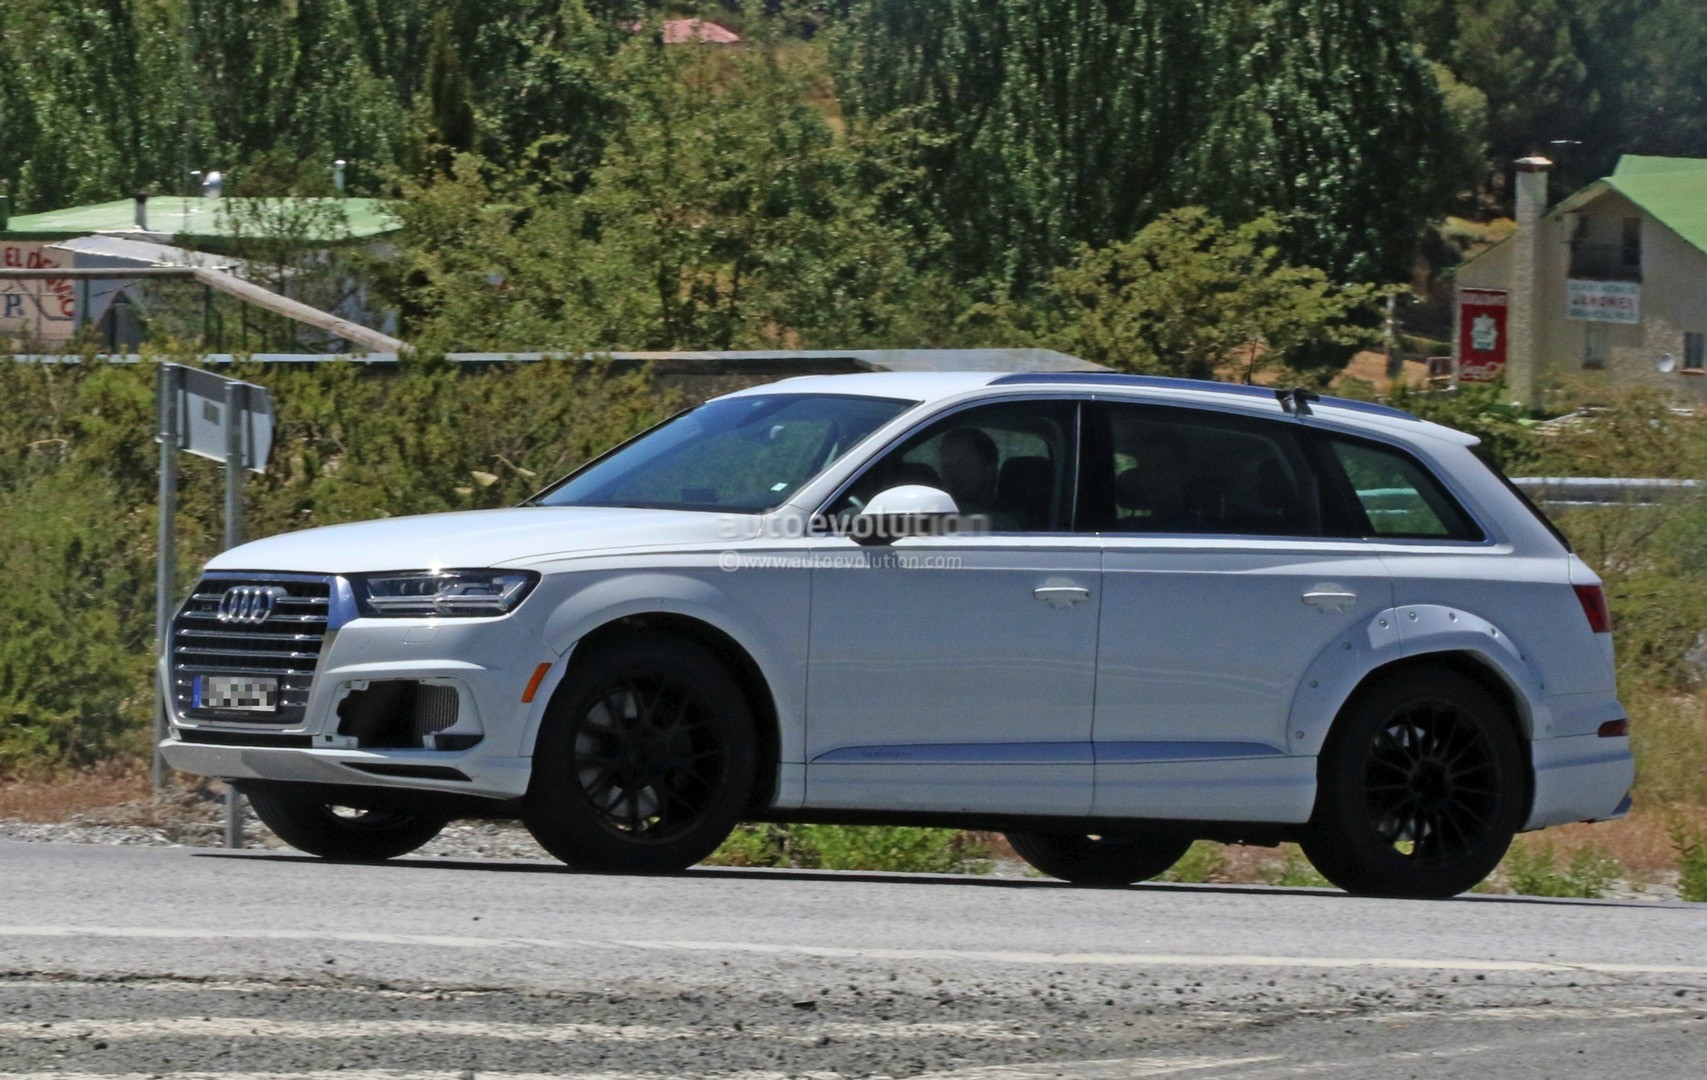 2018 Audi Q8 Test Mule Spied Wearing Q7 Bodyshell